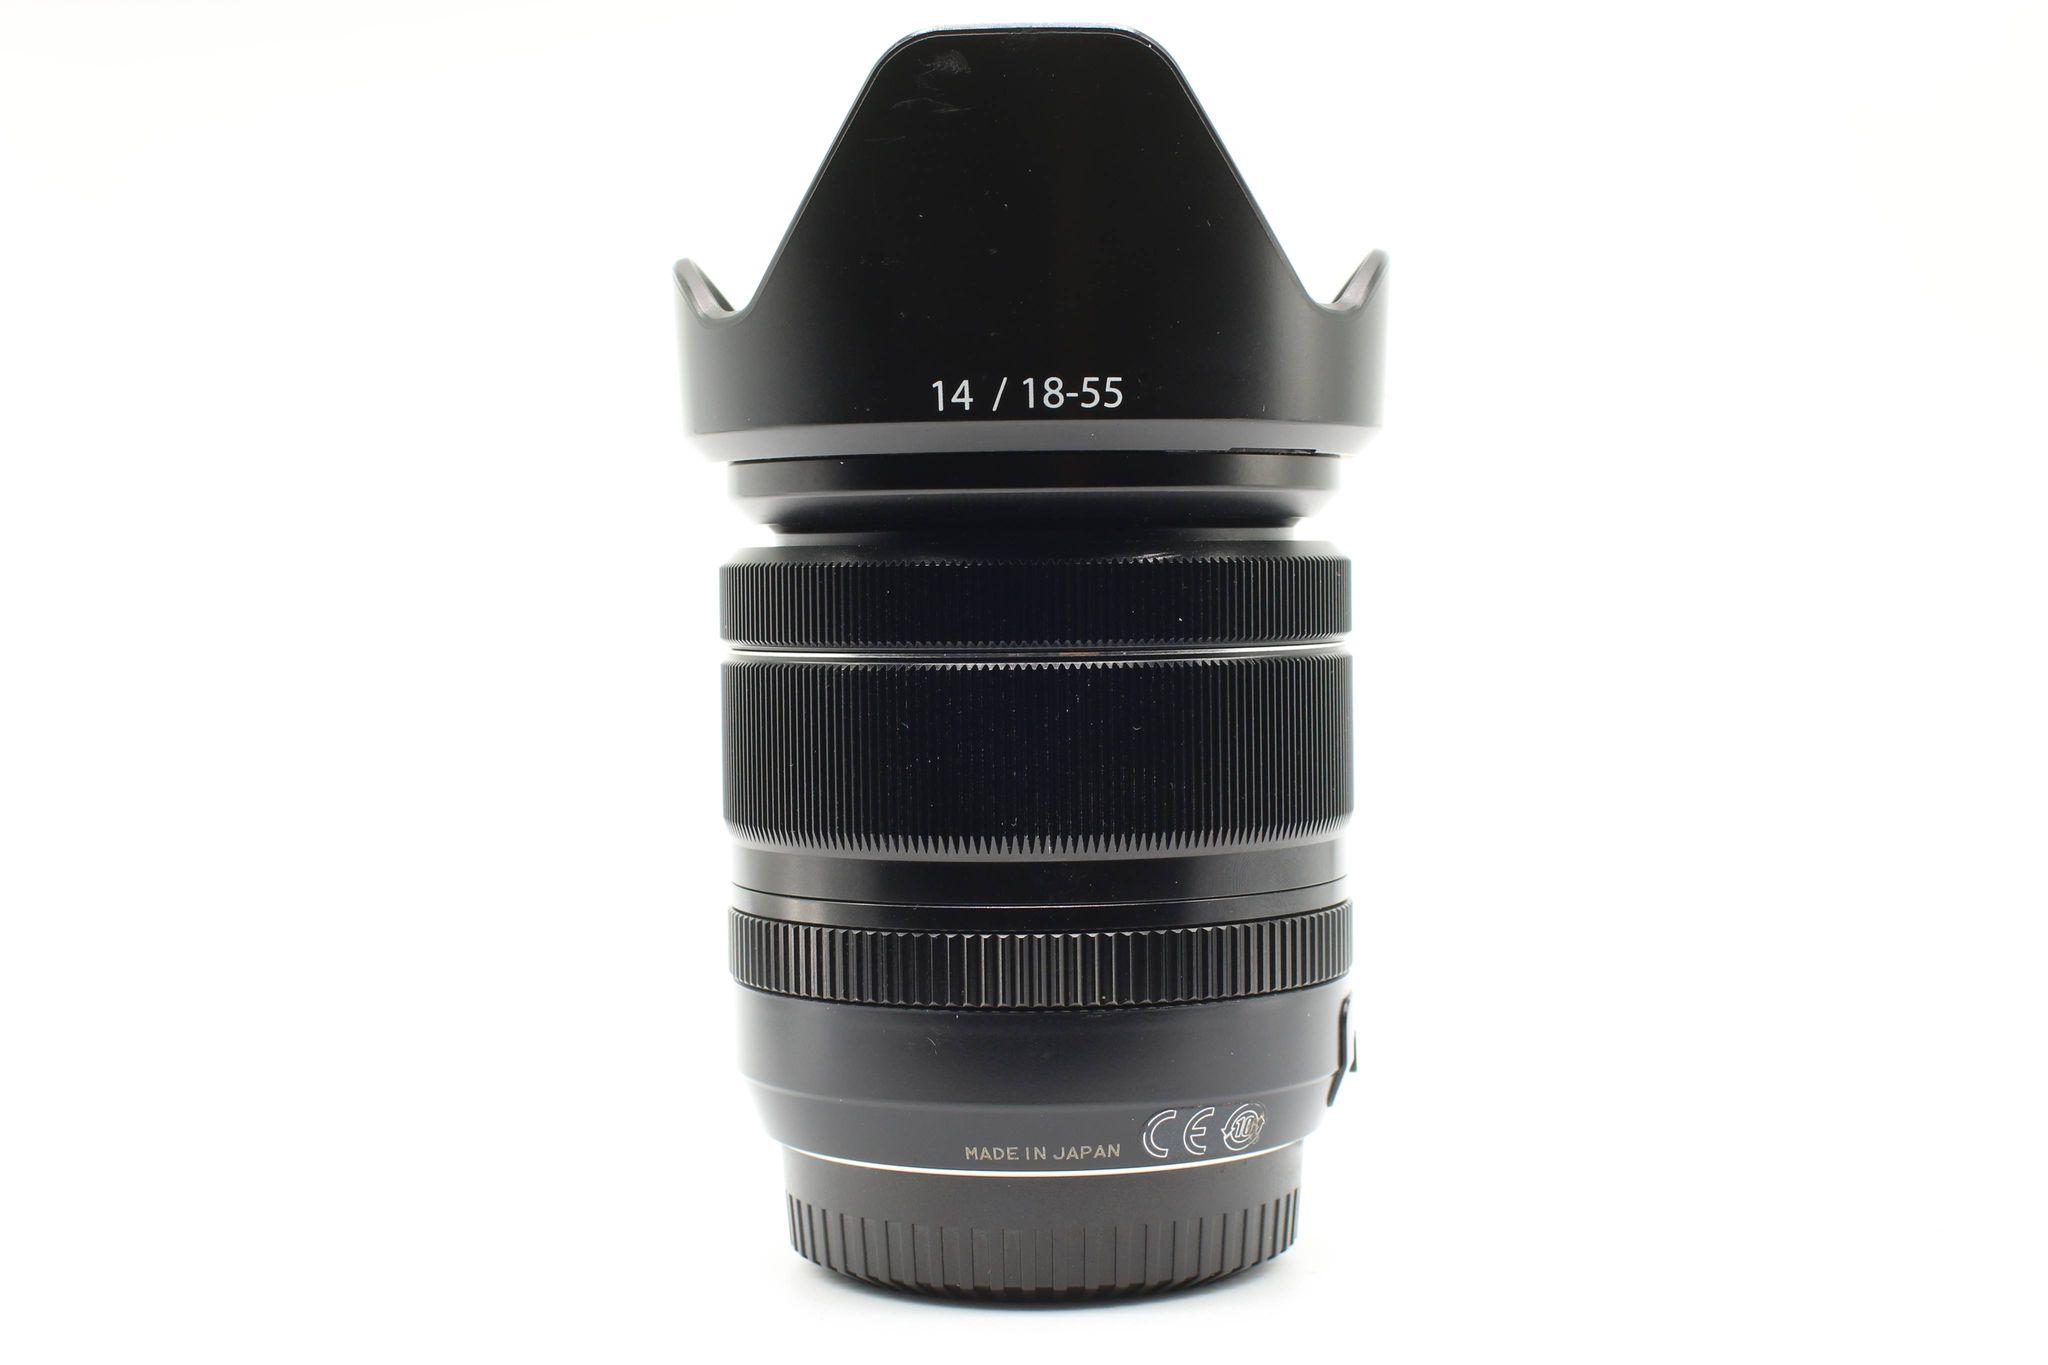 Ống kính Fujifilm XF 18-55mm f / 2.8-4 R LM OIS